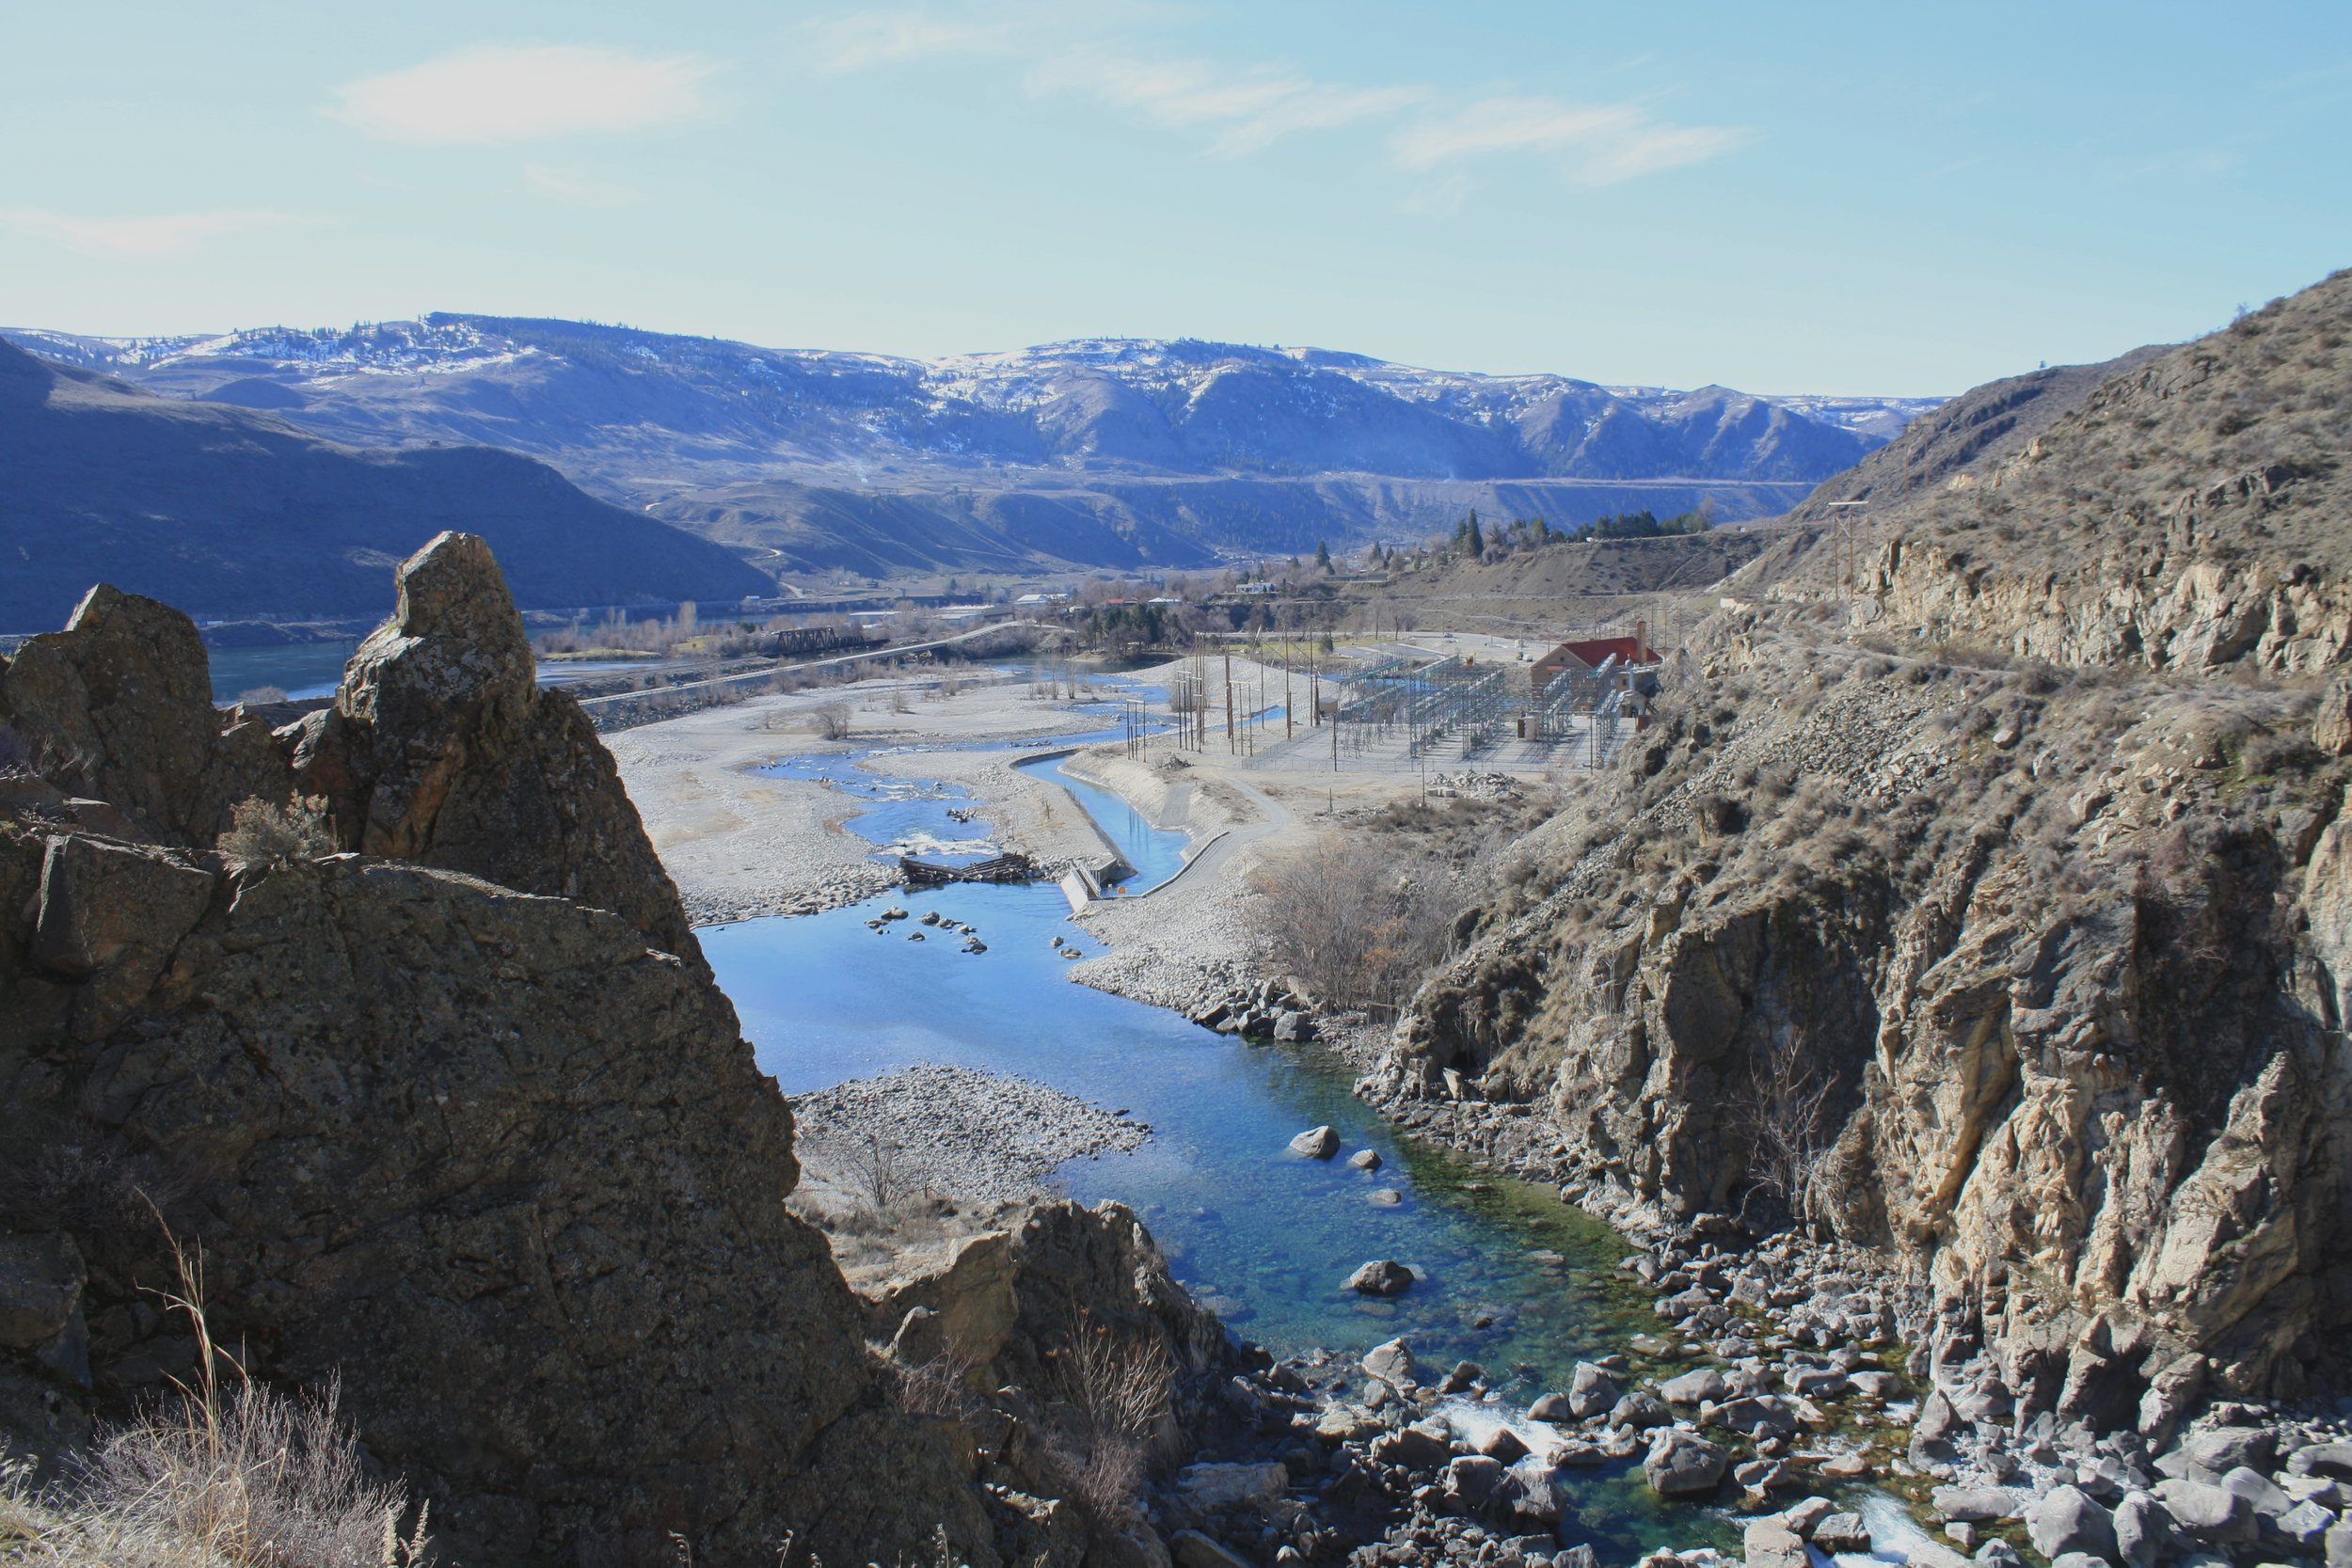 Reach 4 of the Chelan River